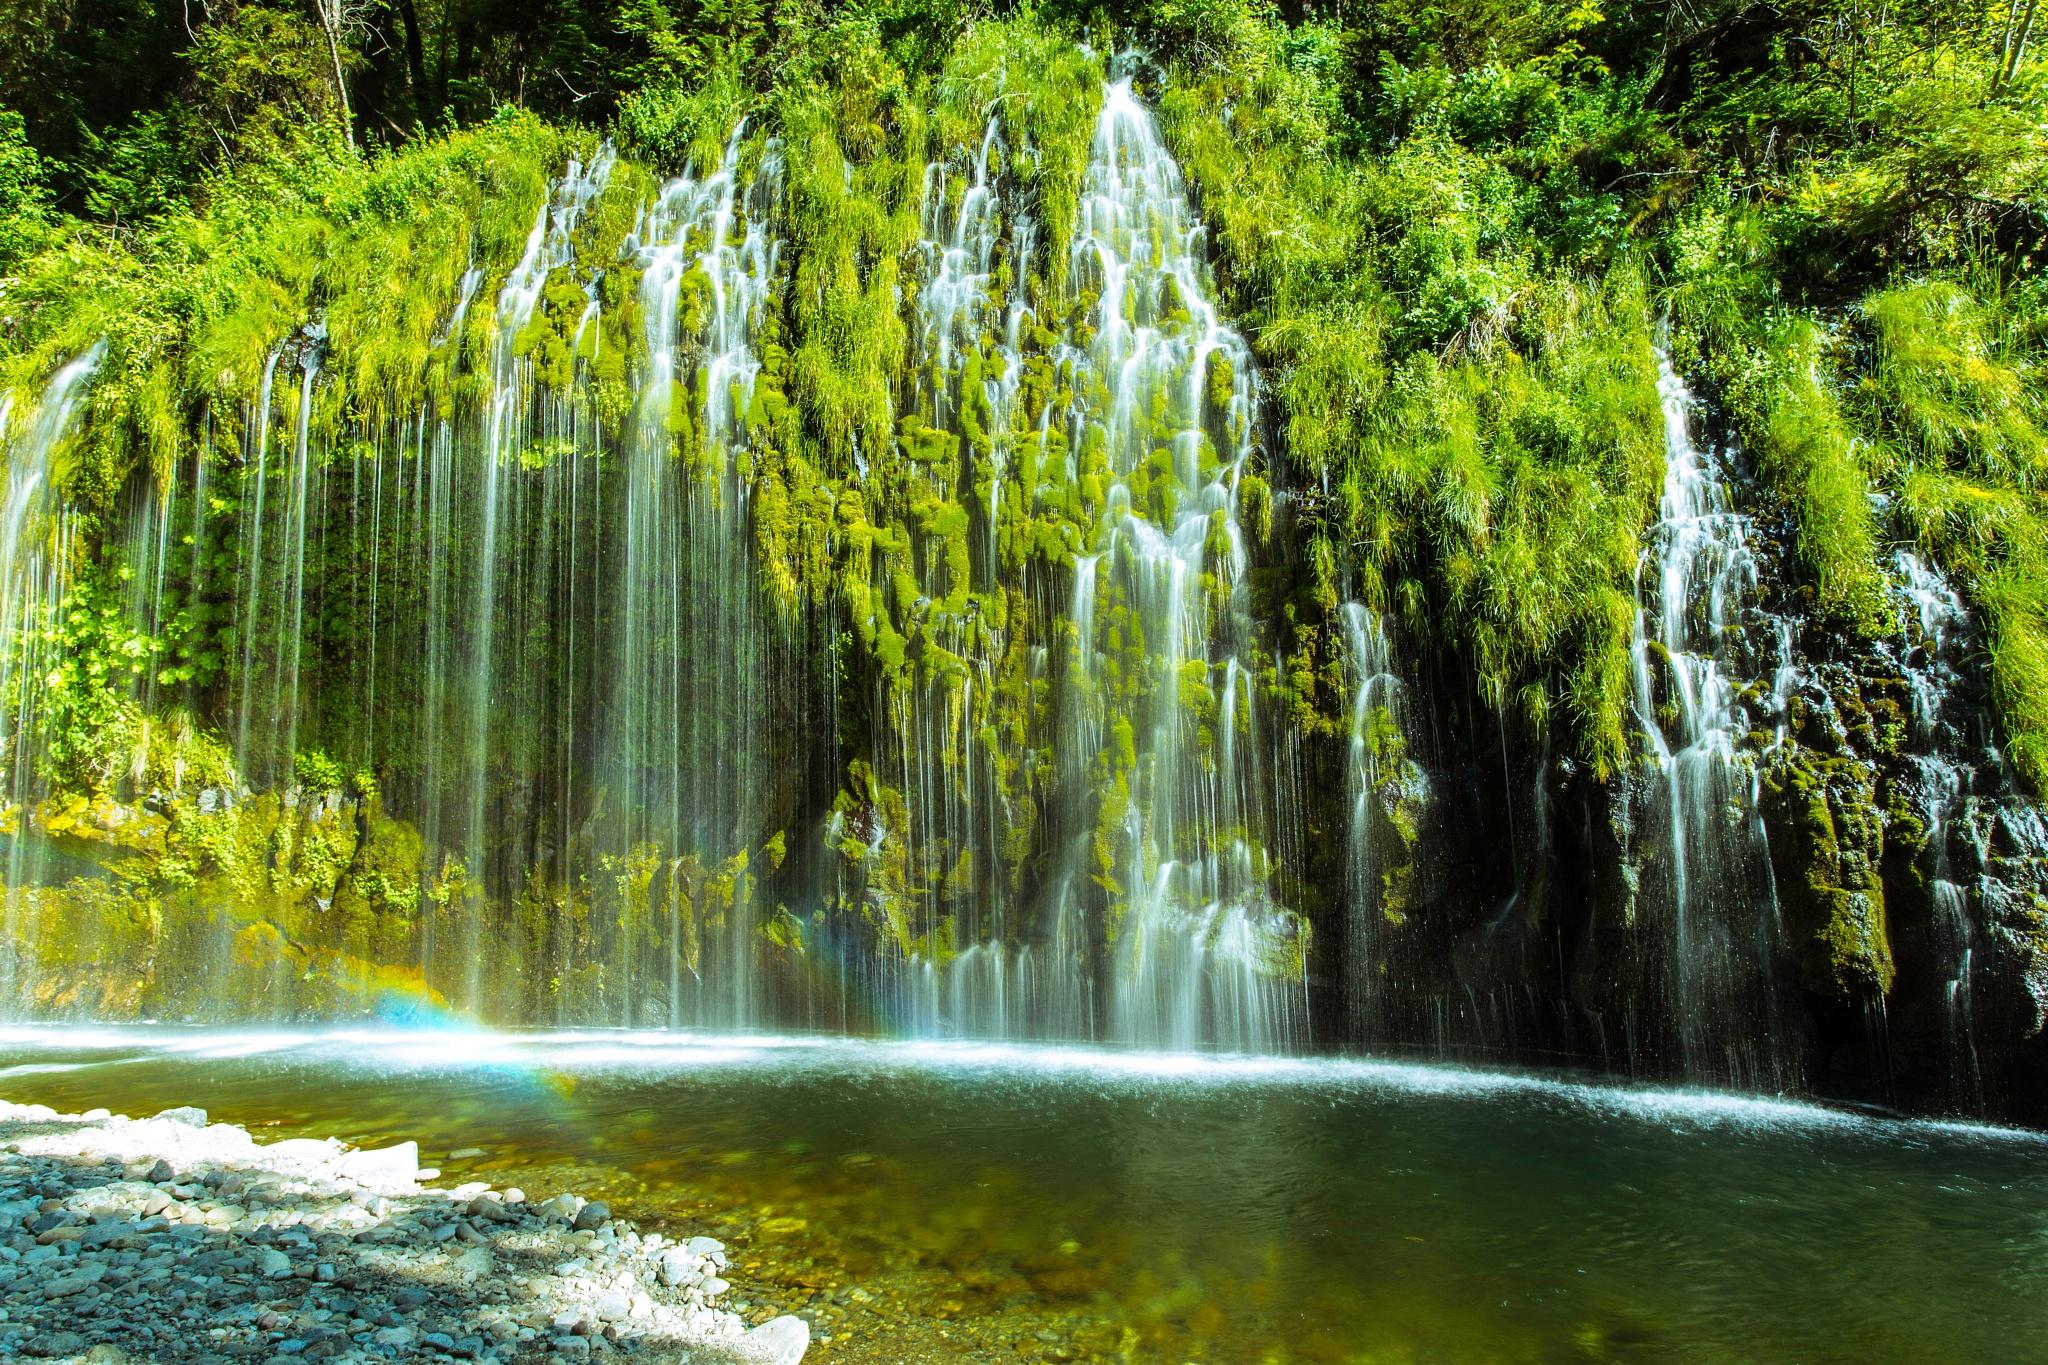 Mossbrae Falls and Small Rainbow by DanBlackburn